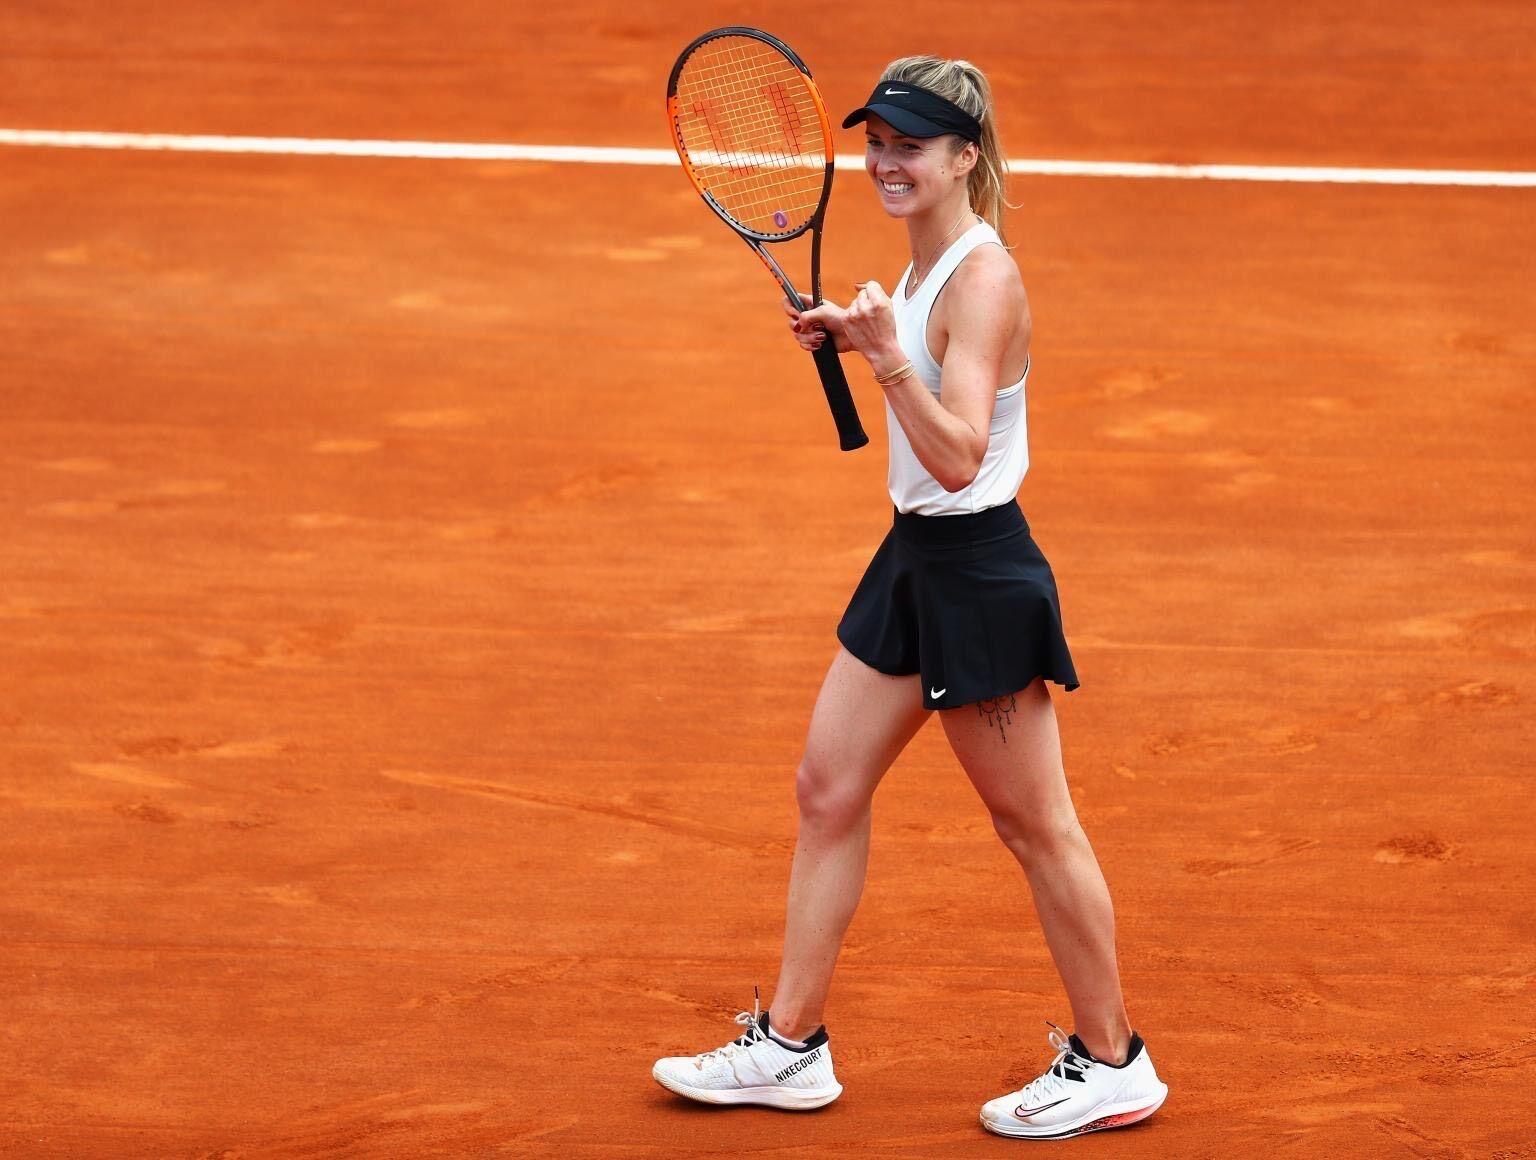 Элина Свитолина дошла до четвертьфинала Roland Garros-2020.